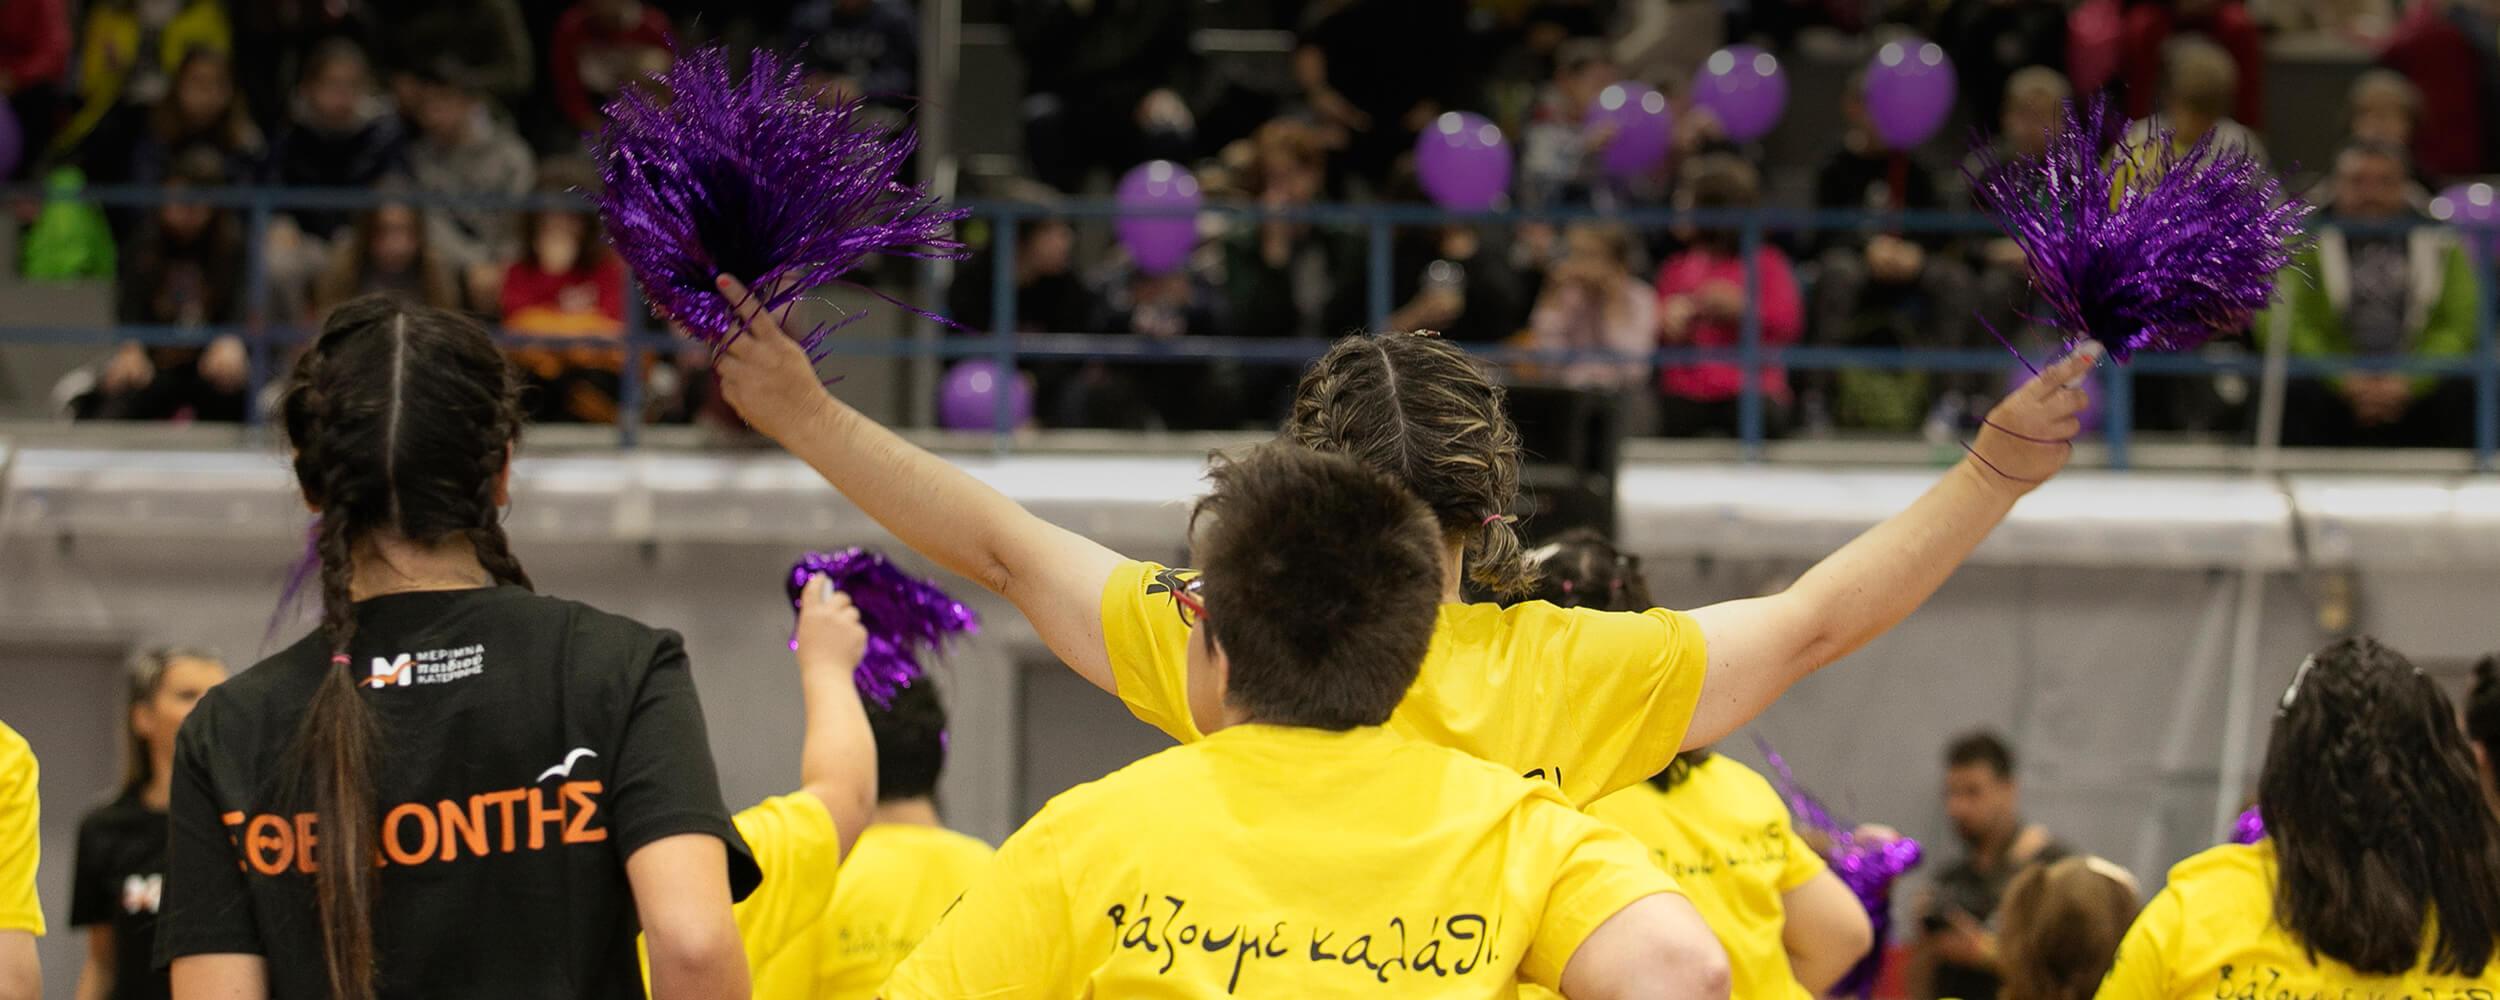 Unity Baskeball Tournament